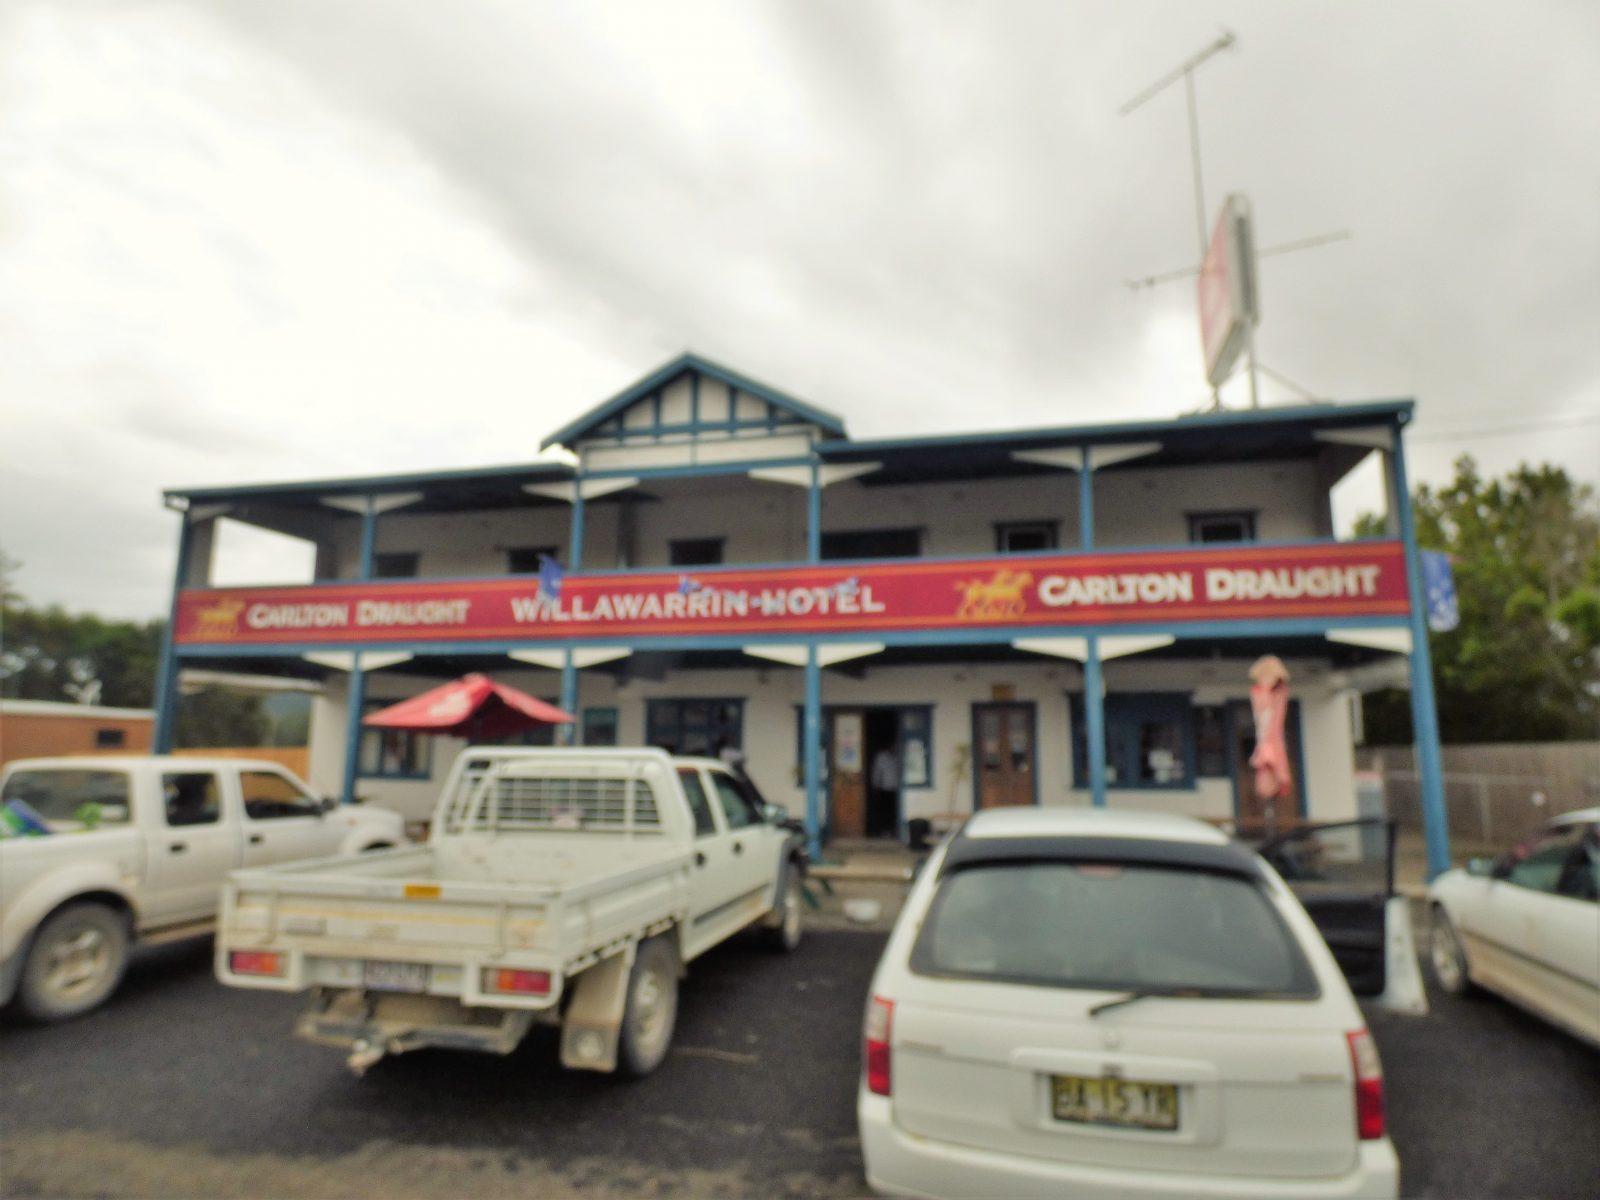 Willawarrin hotel